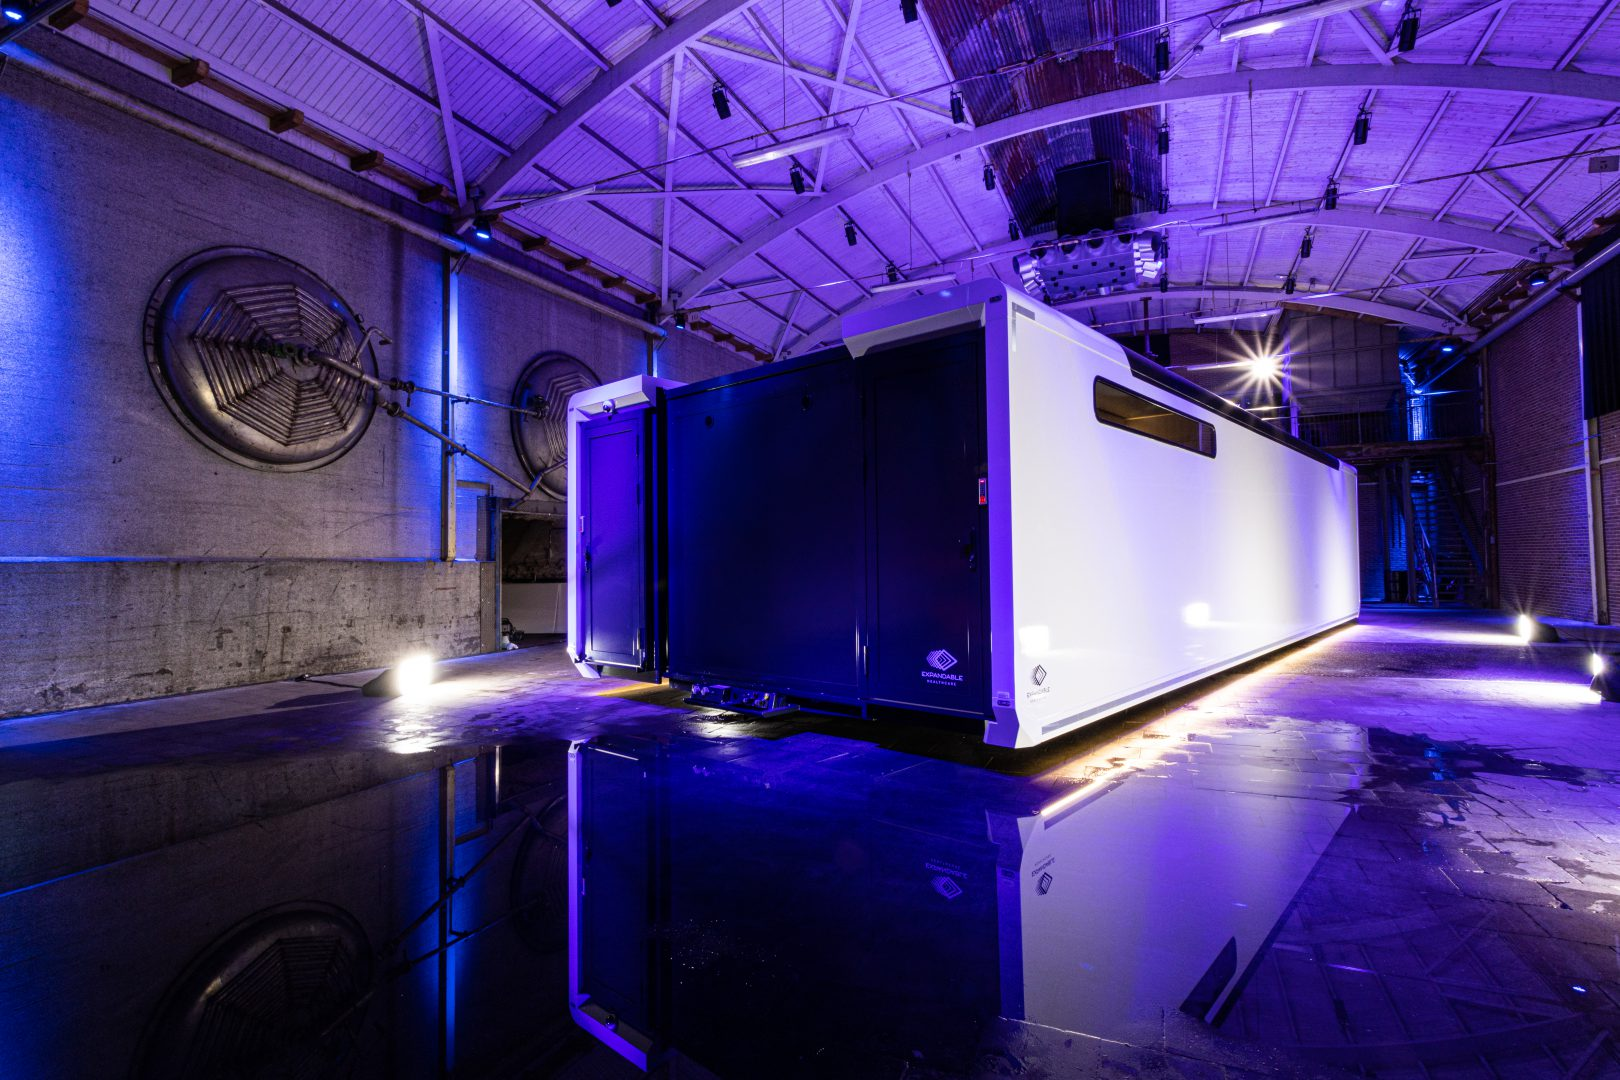 Mobiele-CT-scan-unit-cleanroom-zorg-interieur-container-ZIJLSTRA-SCHIPPER-architecten-architectenbureau-noord-holland-architect-006